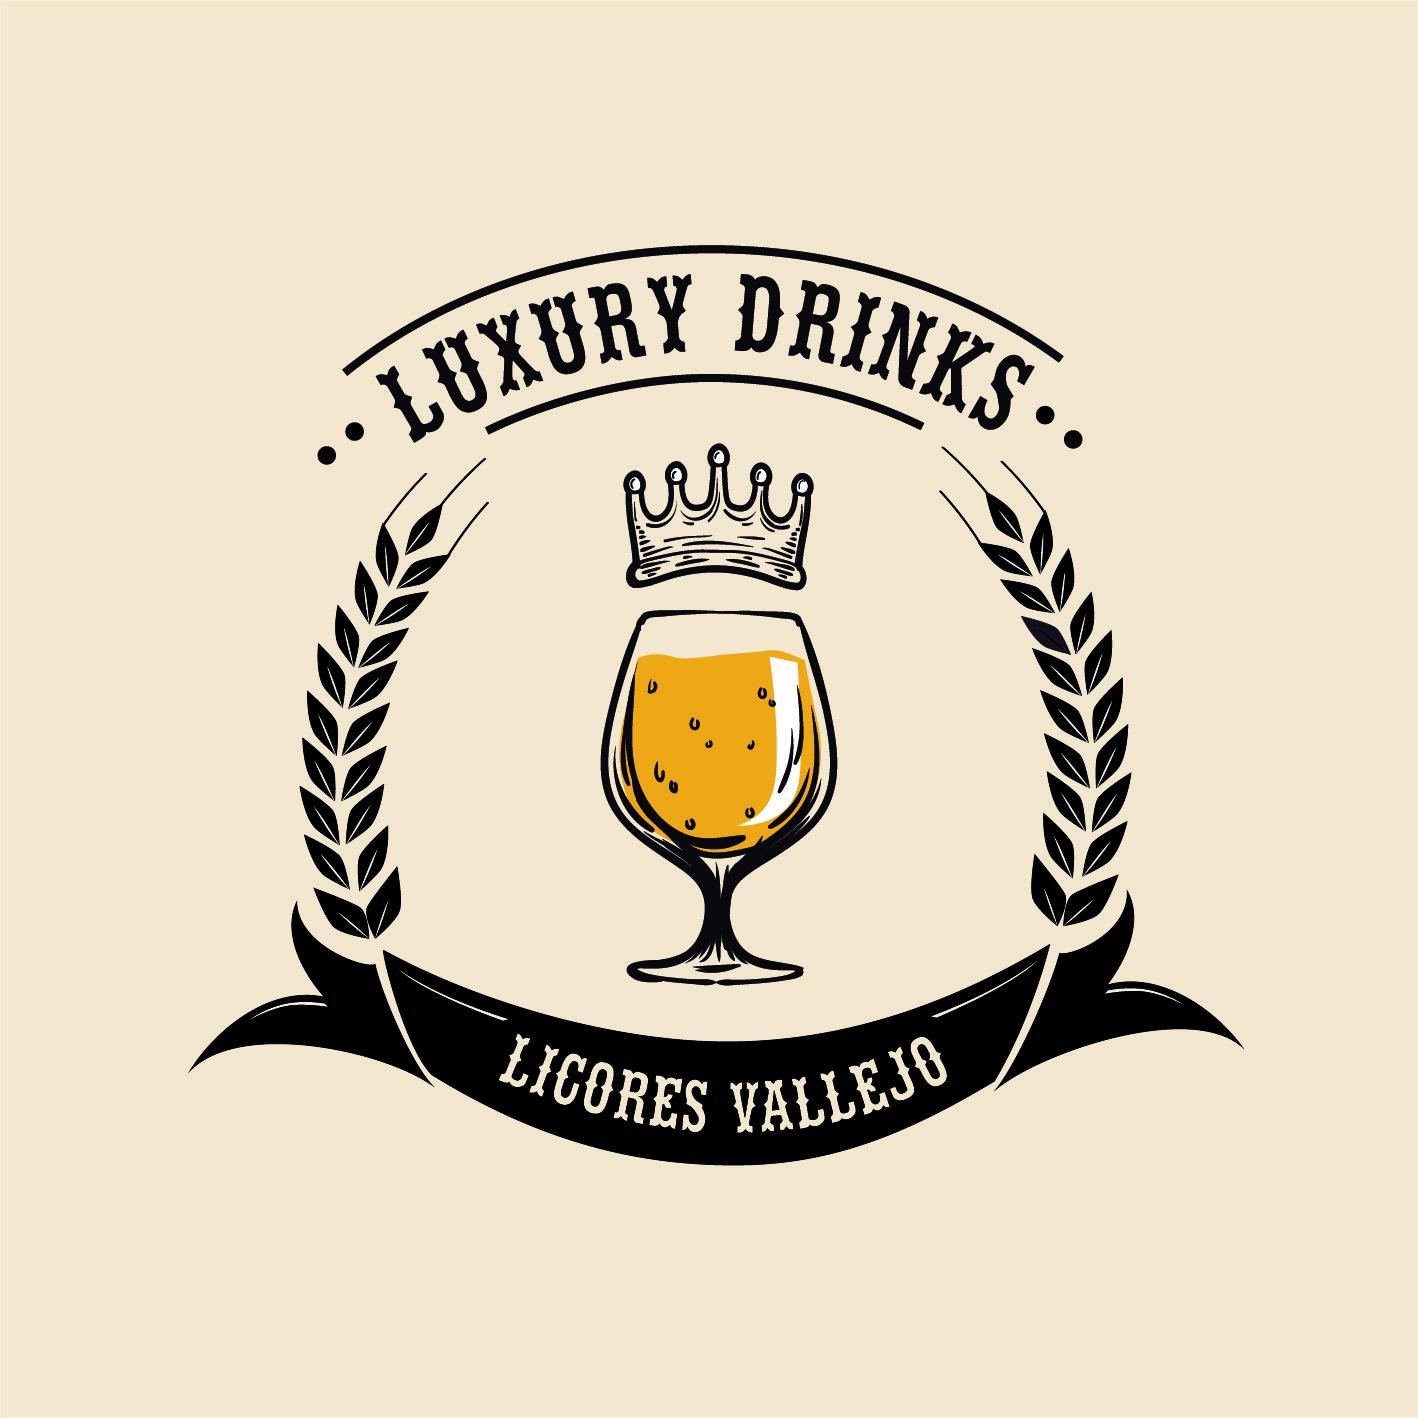 Licores Luxury Drinks Noche